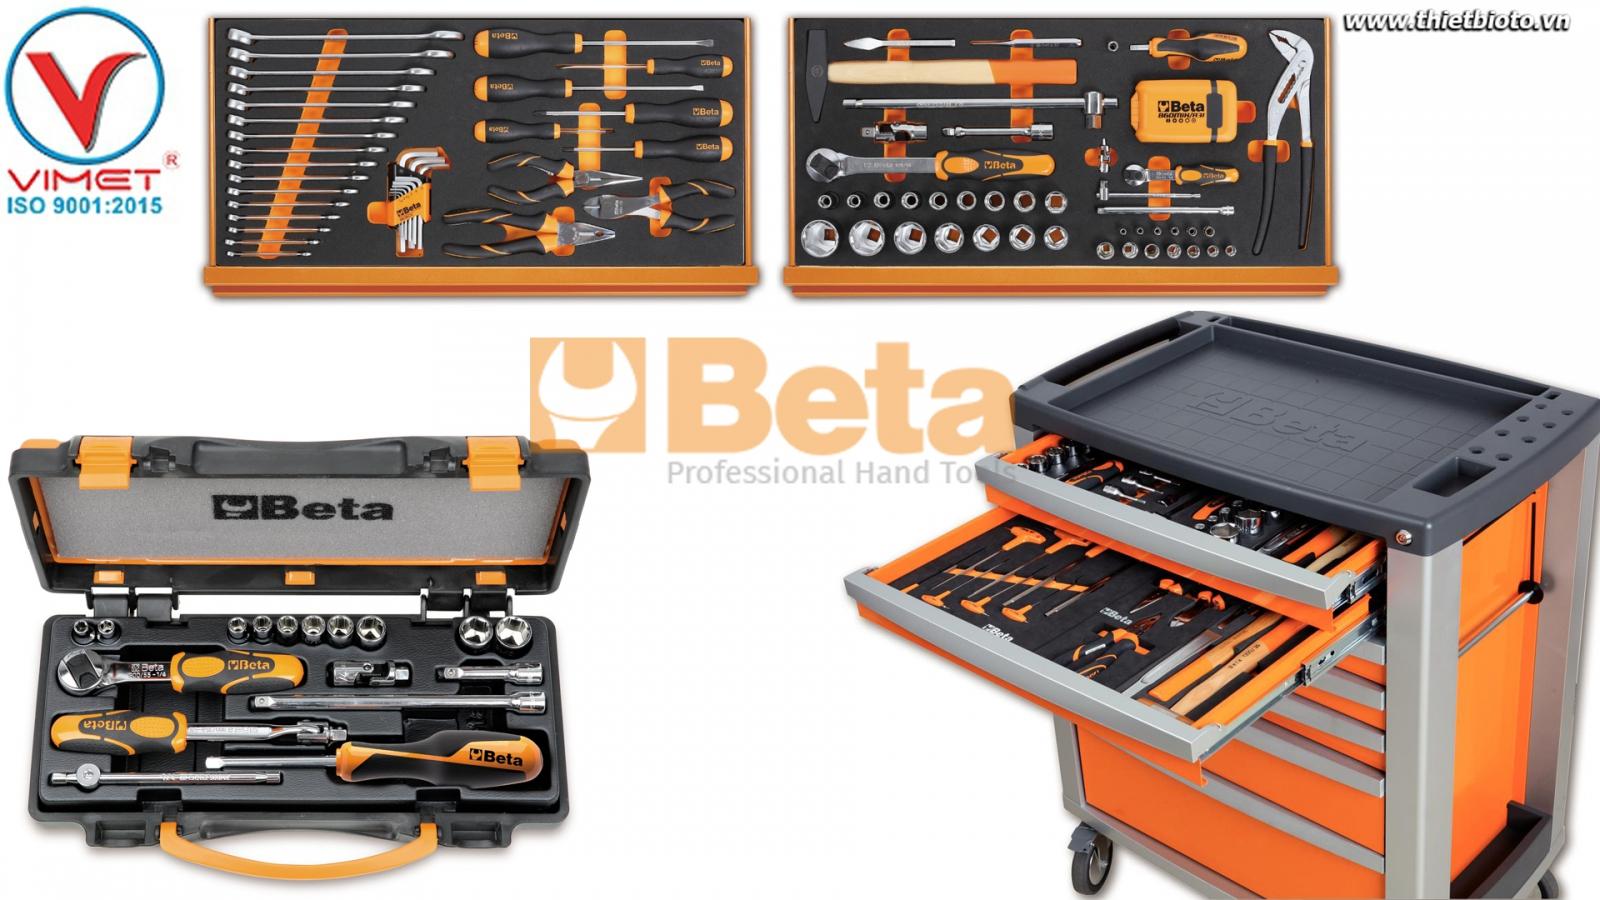 Dụng cụ cầm tay Beta